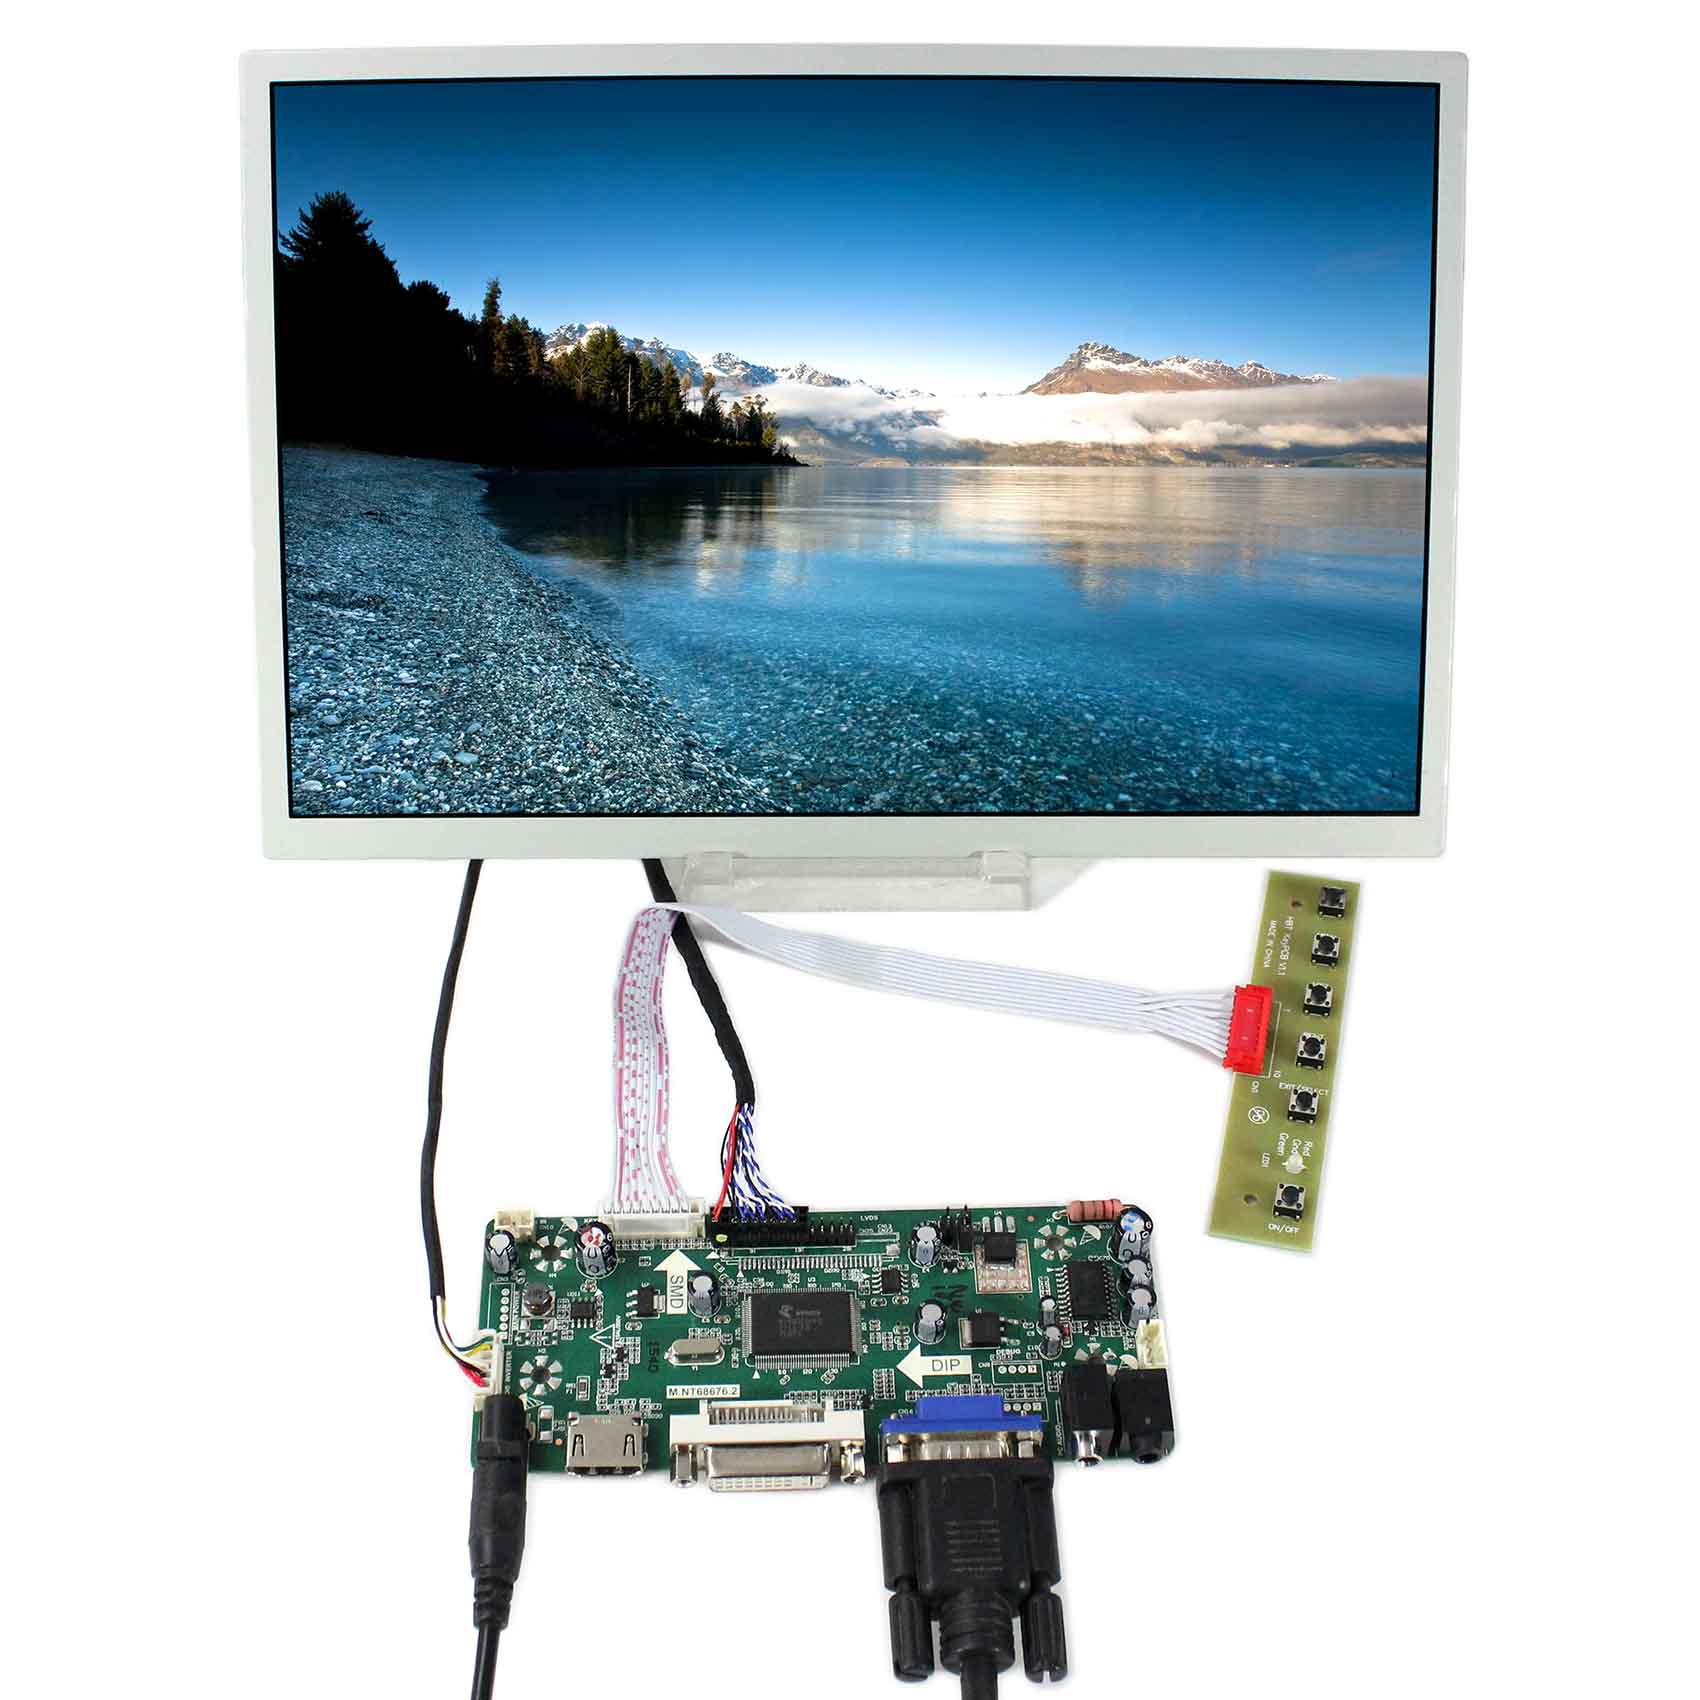 HDMI+DVI+VGA+AUDIO LCD Controller Board With 12.1inch 1280x800 LQ121K1LG52 LCD Screen hdmi vga av lcd controller board for 14 1inch 15 4inch 1280x800 ltn141at01 b141ew02 b154ew02 lp154wx4 lcd screen